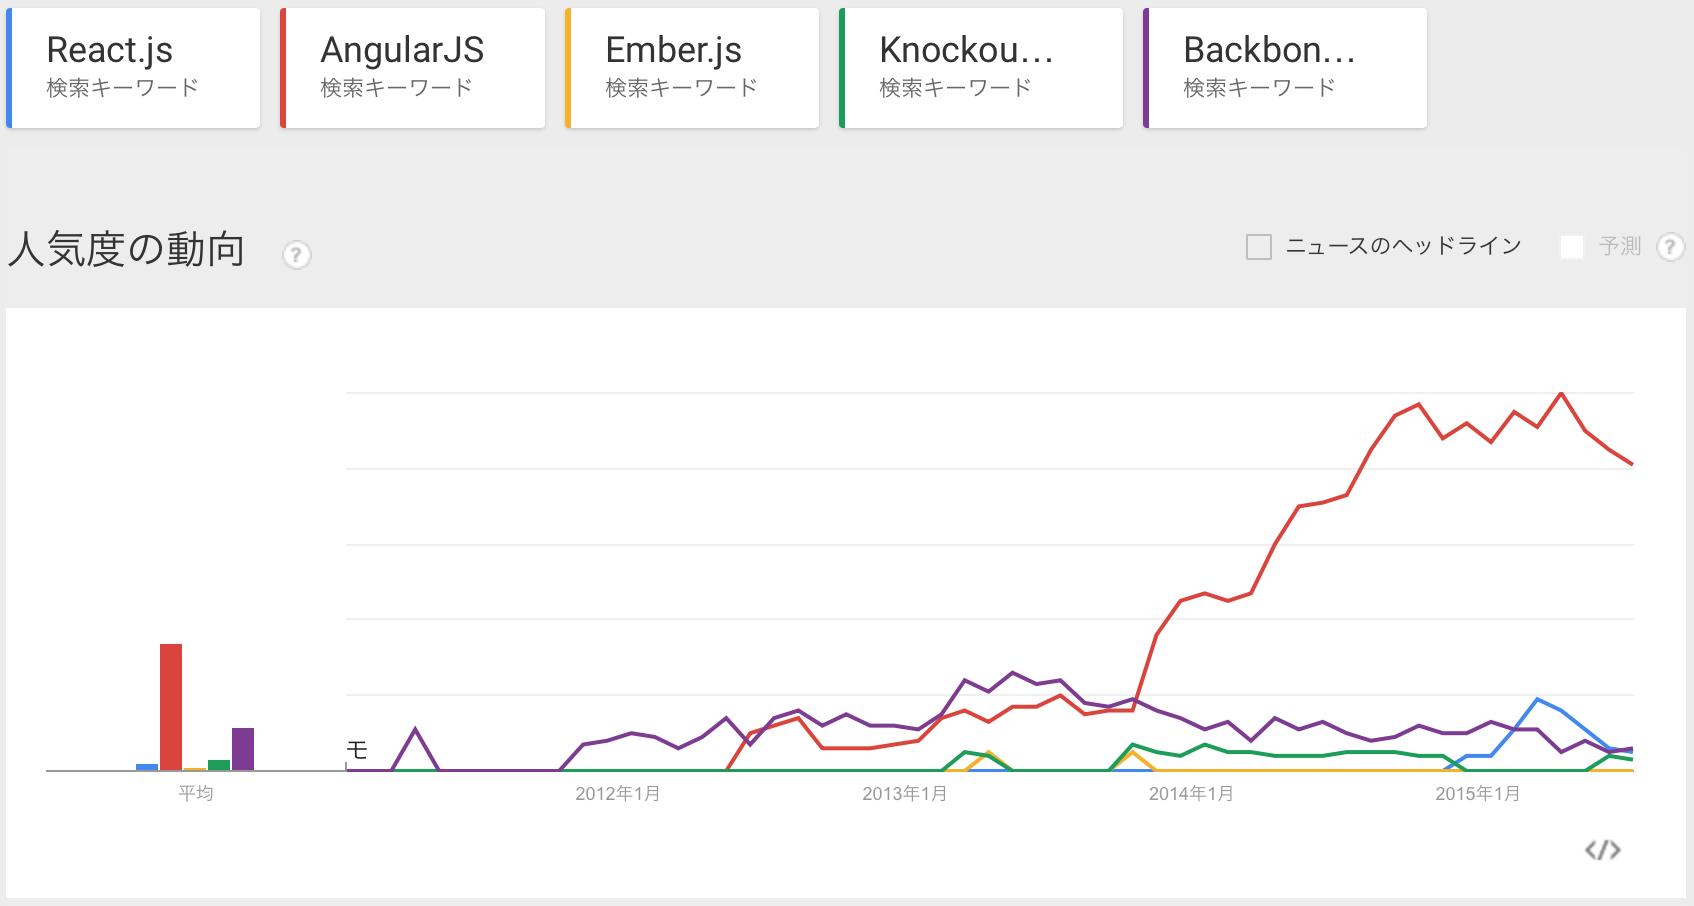 JSフレームワークトレンド2015@Google Trends